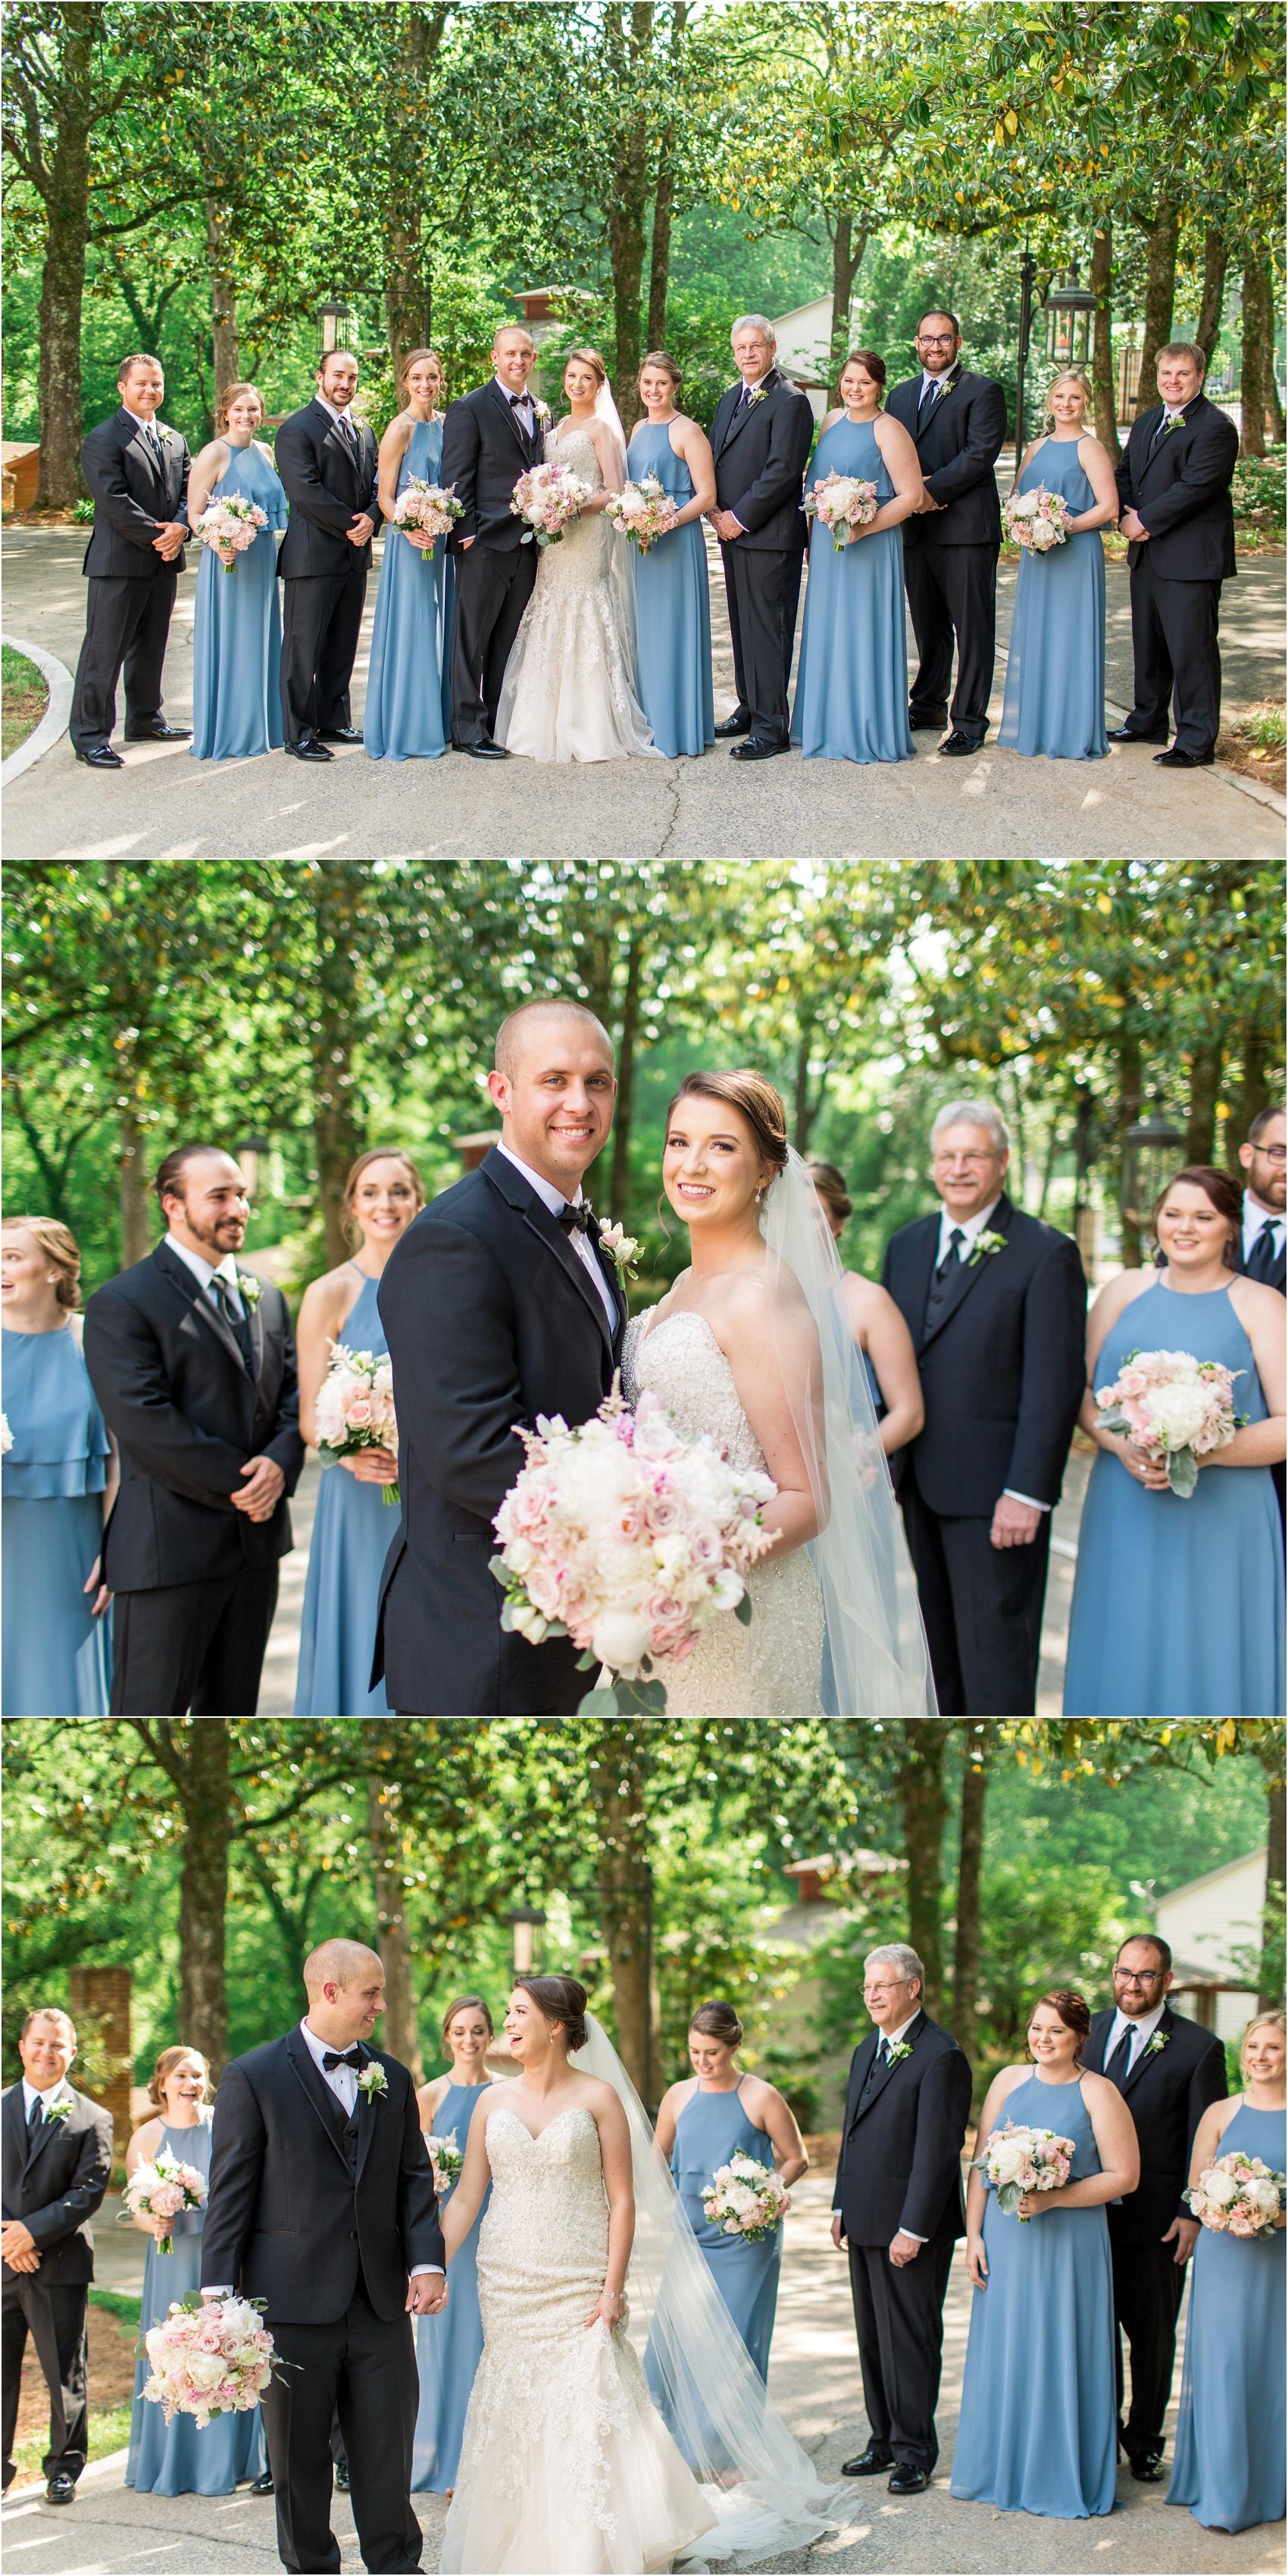 Savannah Eve Photography- Nutt Wedding- Blog-51.jpg